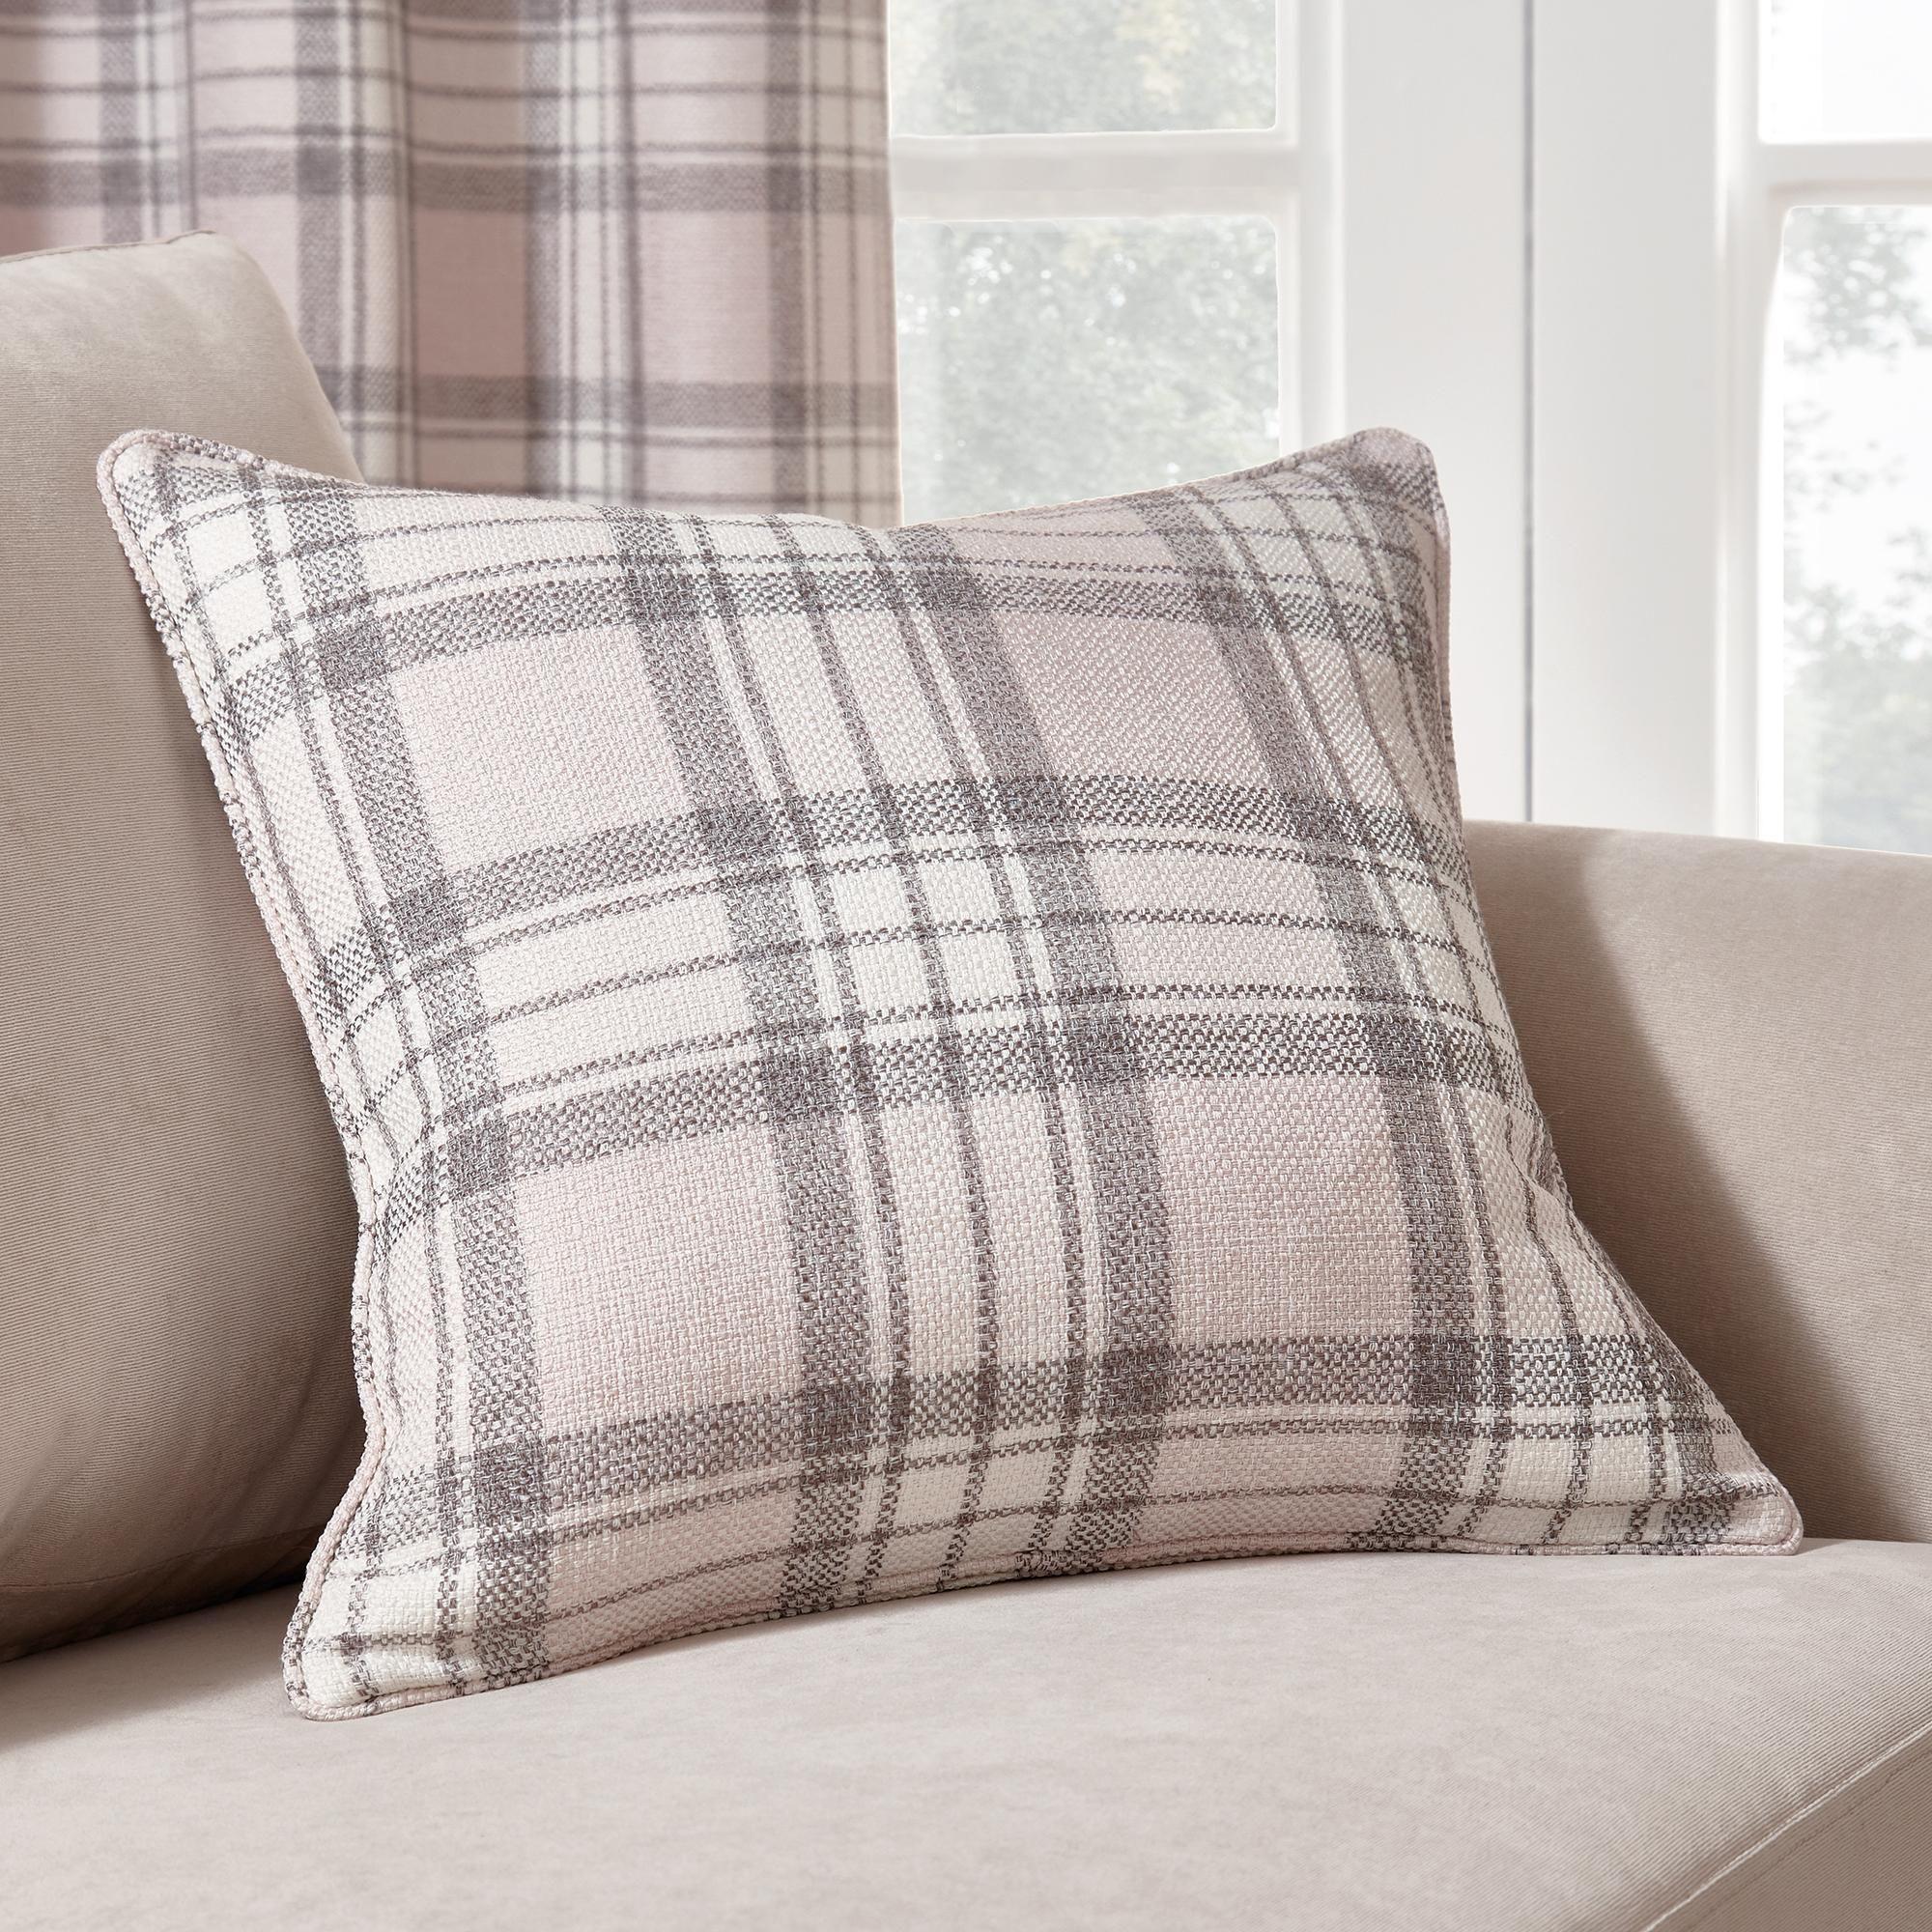 Dunelm Check Pink And Grey Fyfe 45x45cm Cushion Pink And Grey Curtains Grey Eyelet Curtains Pink Grey